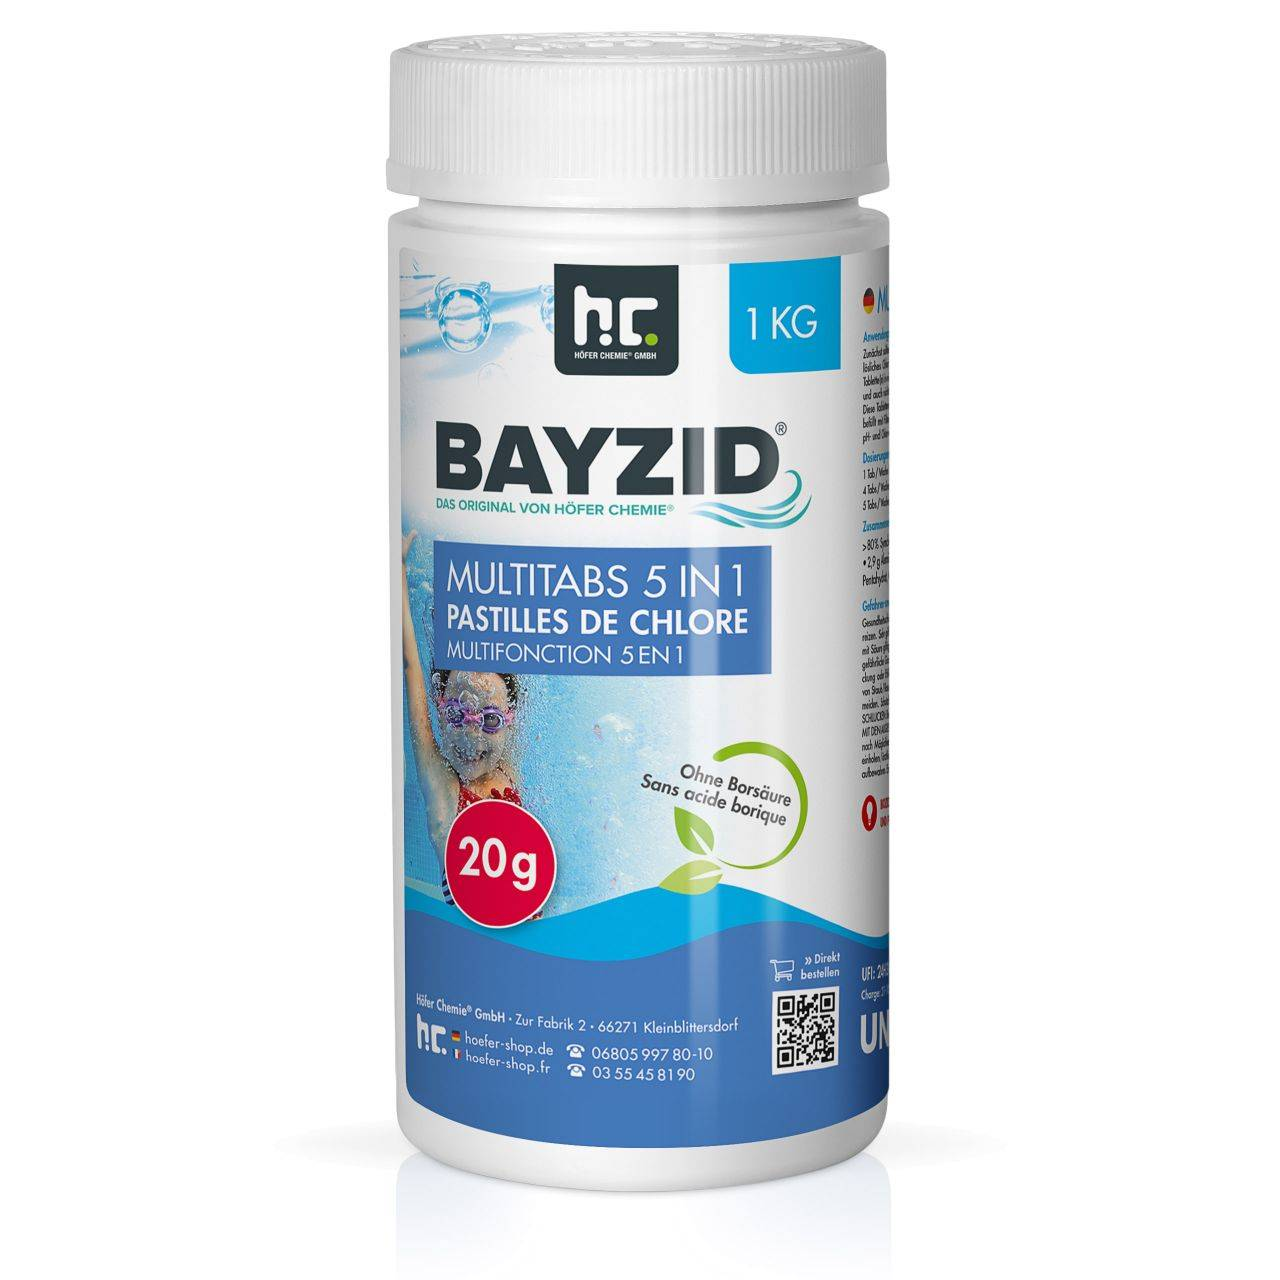 BAYZID 12 kg Bayzid® pastilles de chlore multifonction 20g 5 en 1 (12 x 1 kg)